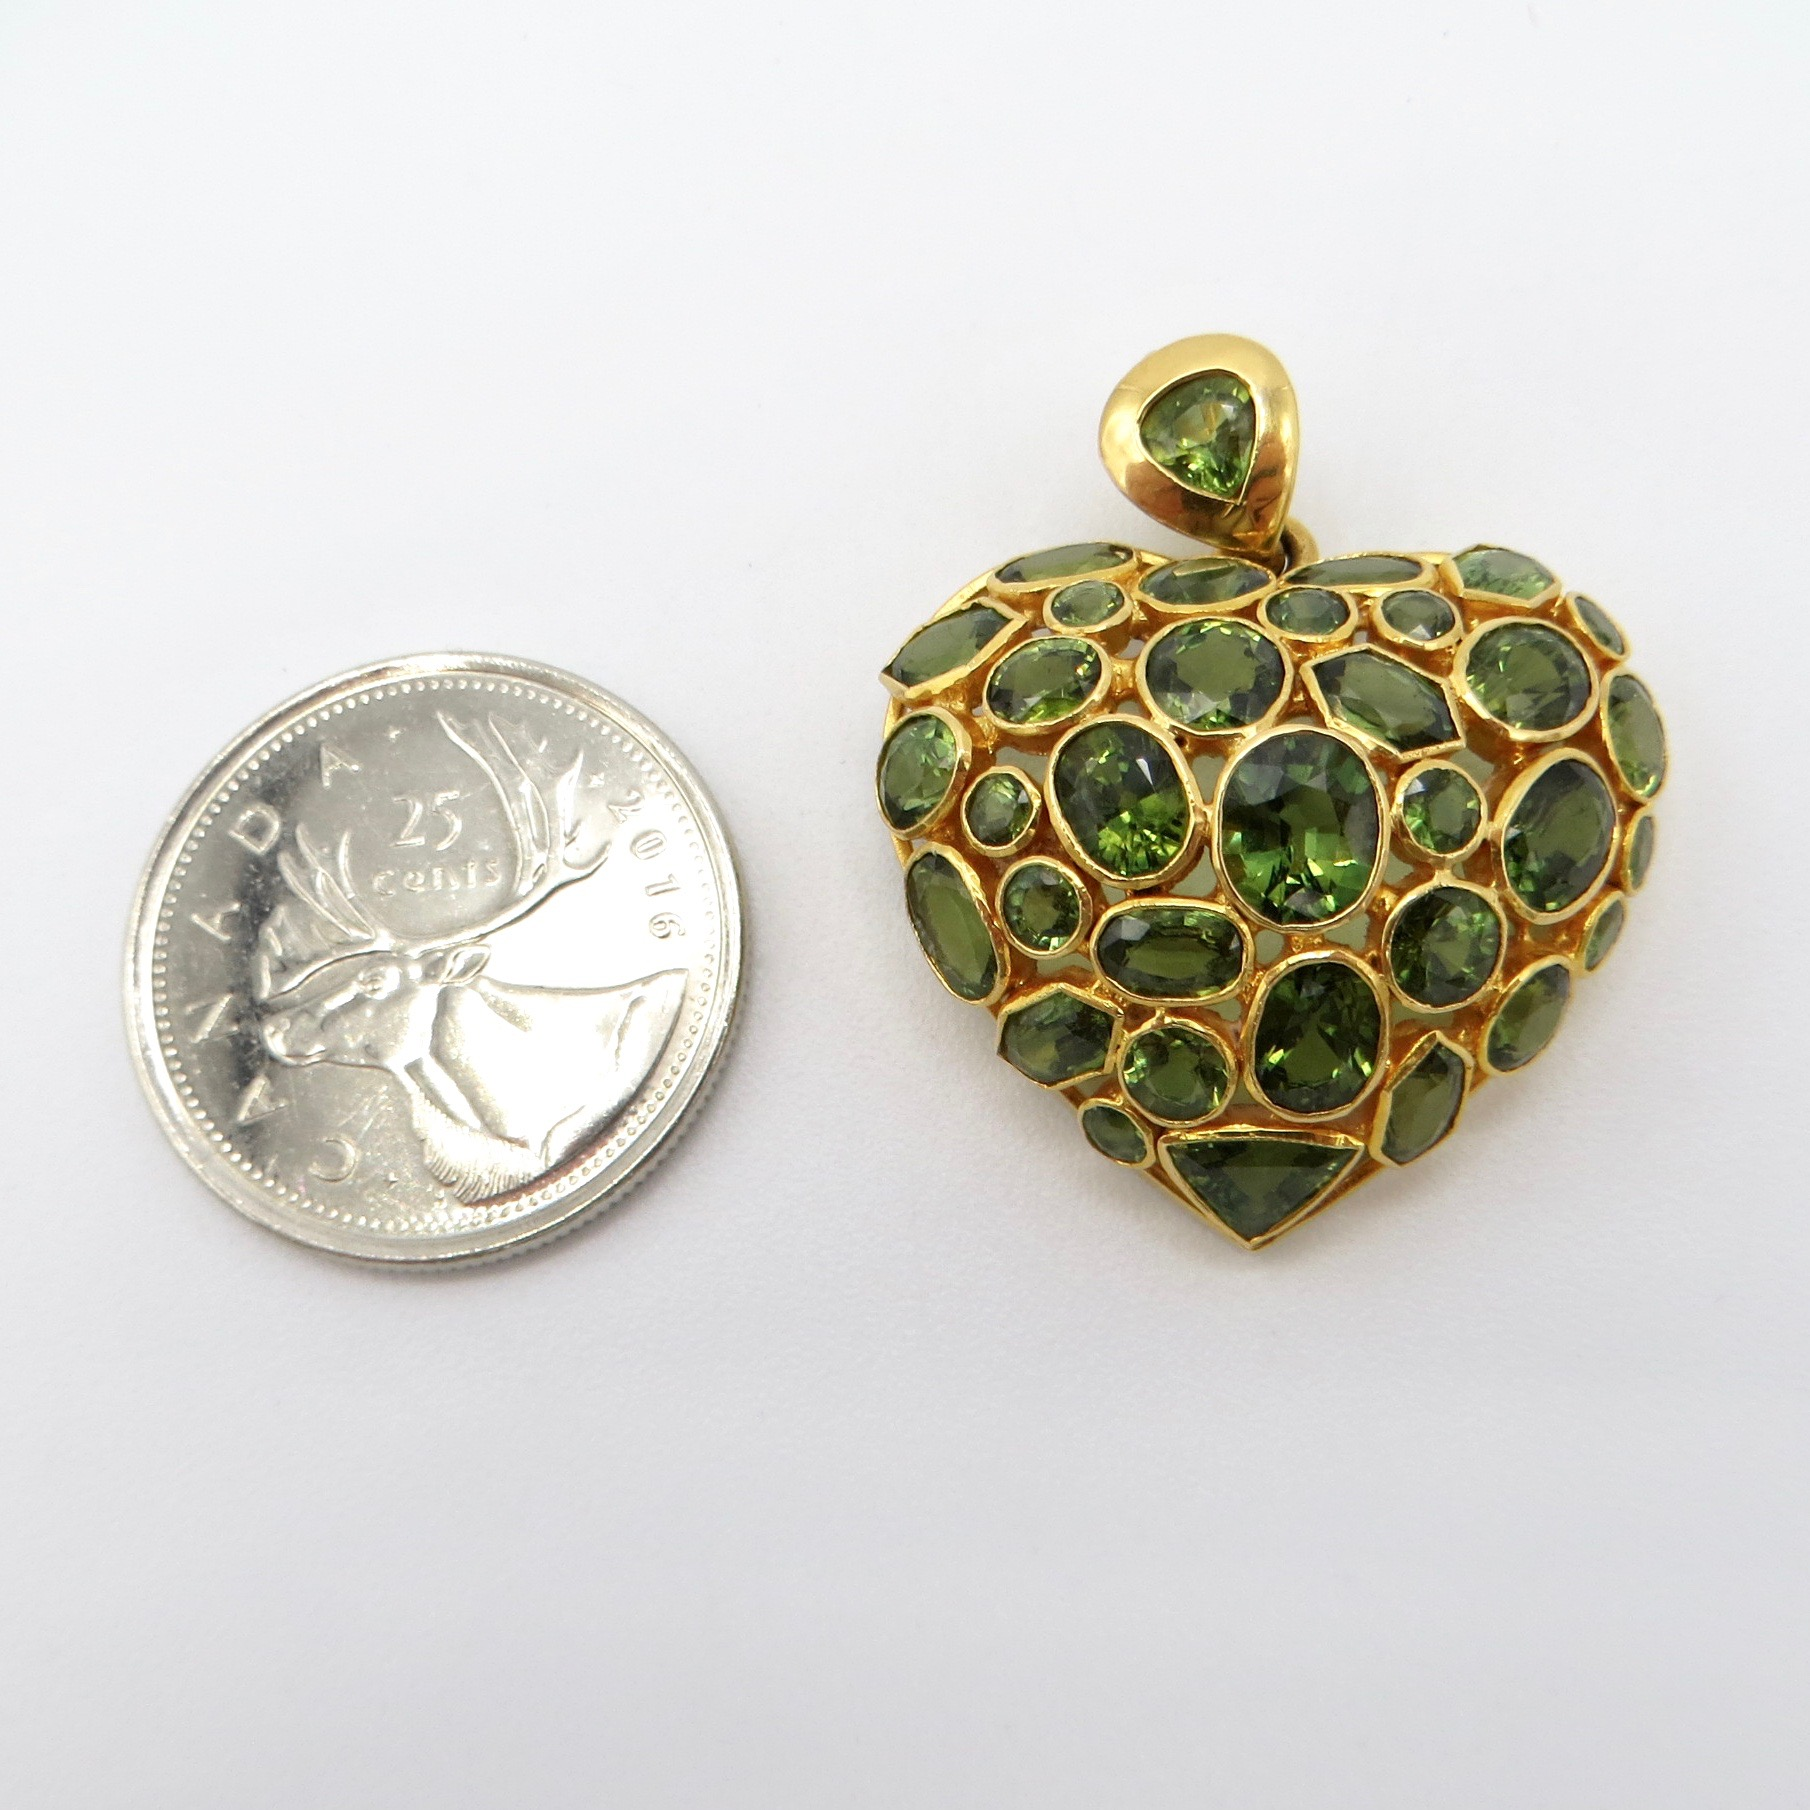 18kt Gold & Coloured Sapphire Heart Pendant